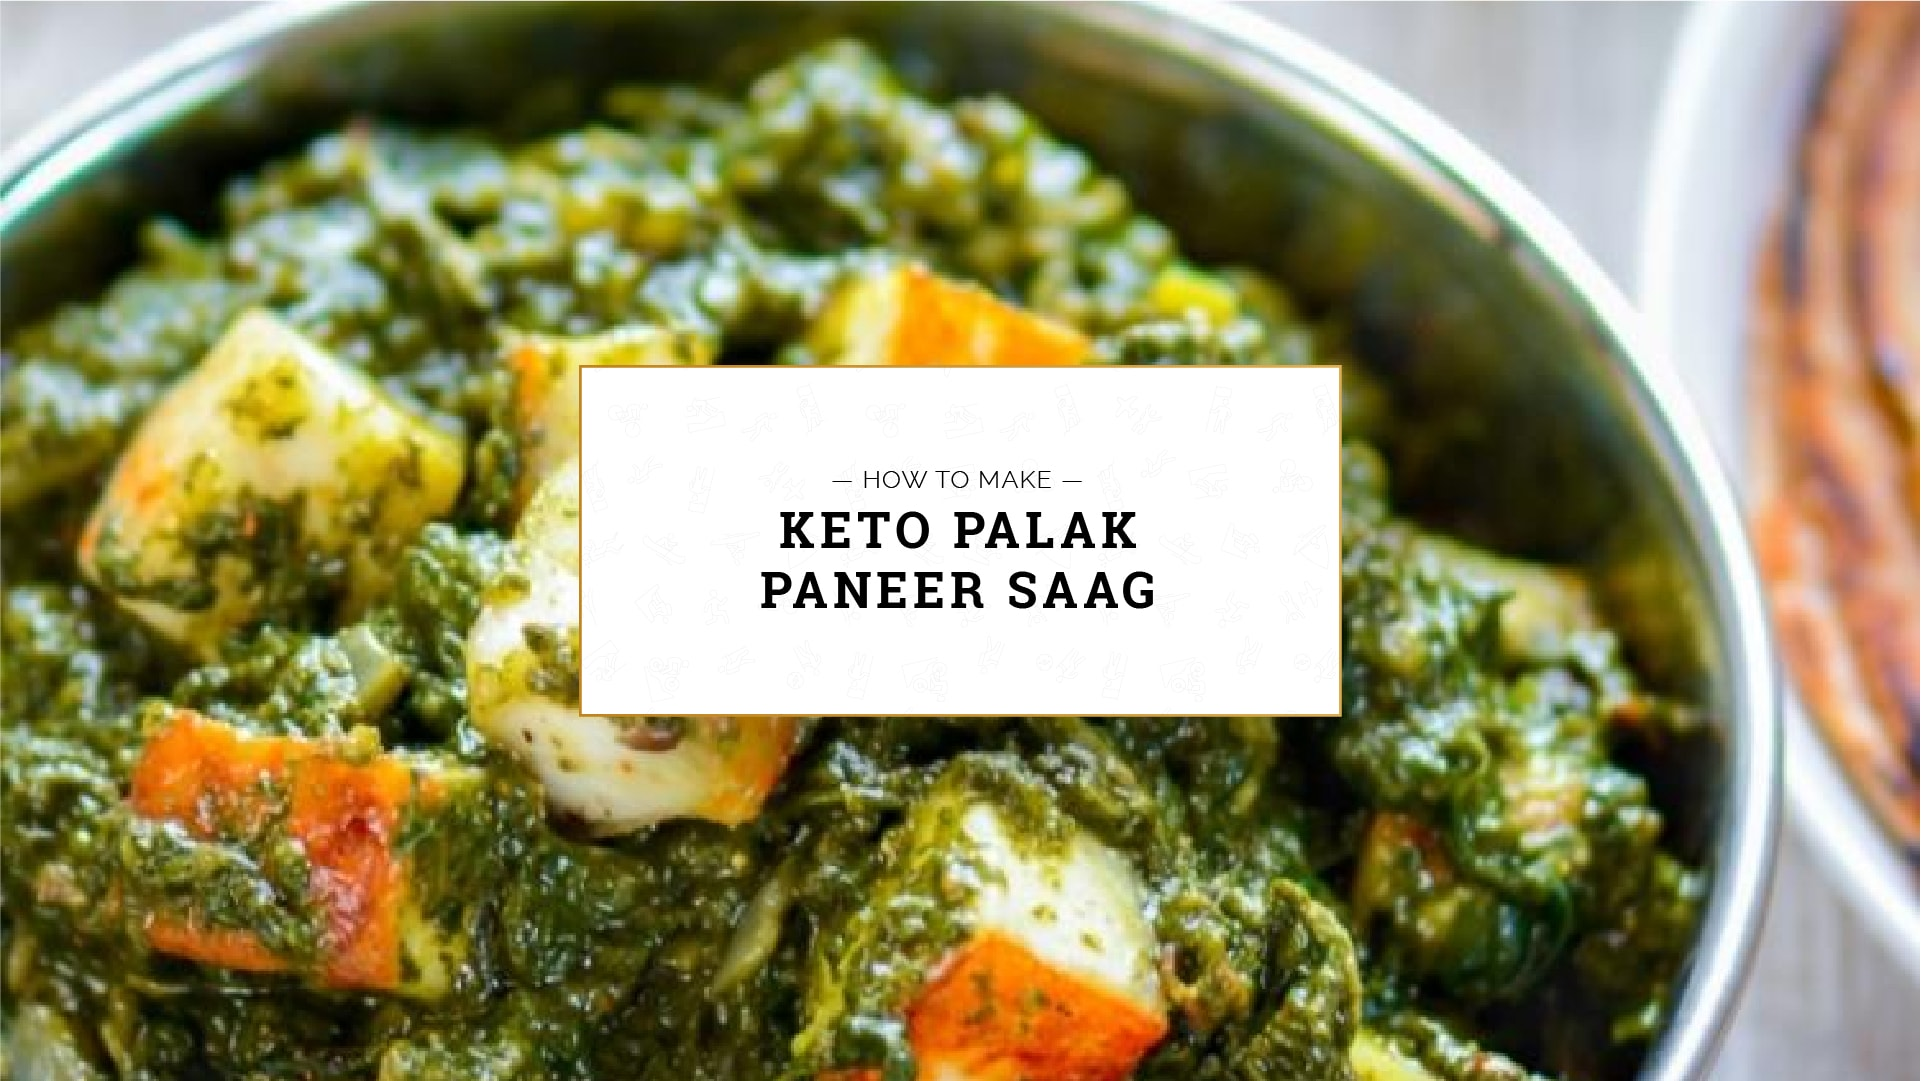 Keto Palak Paneer Saag, how to make keto palak paneer saag